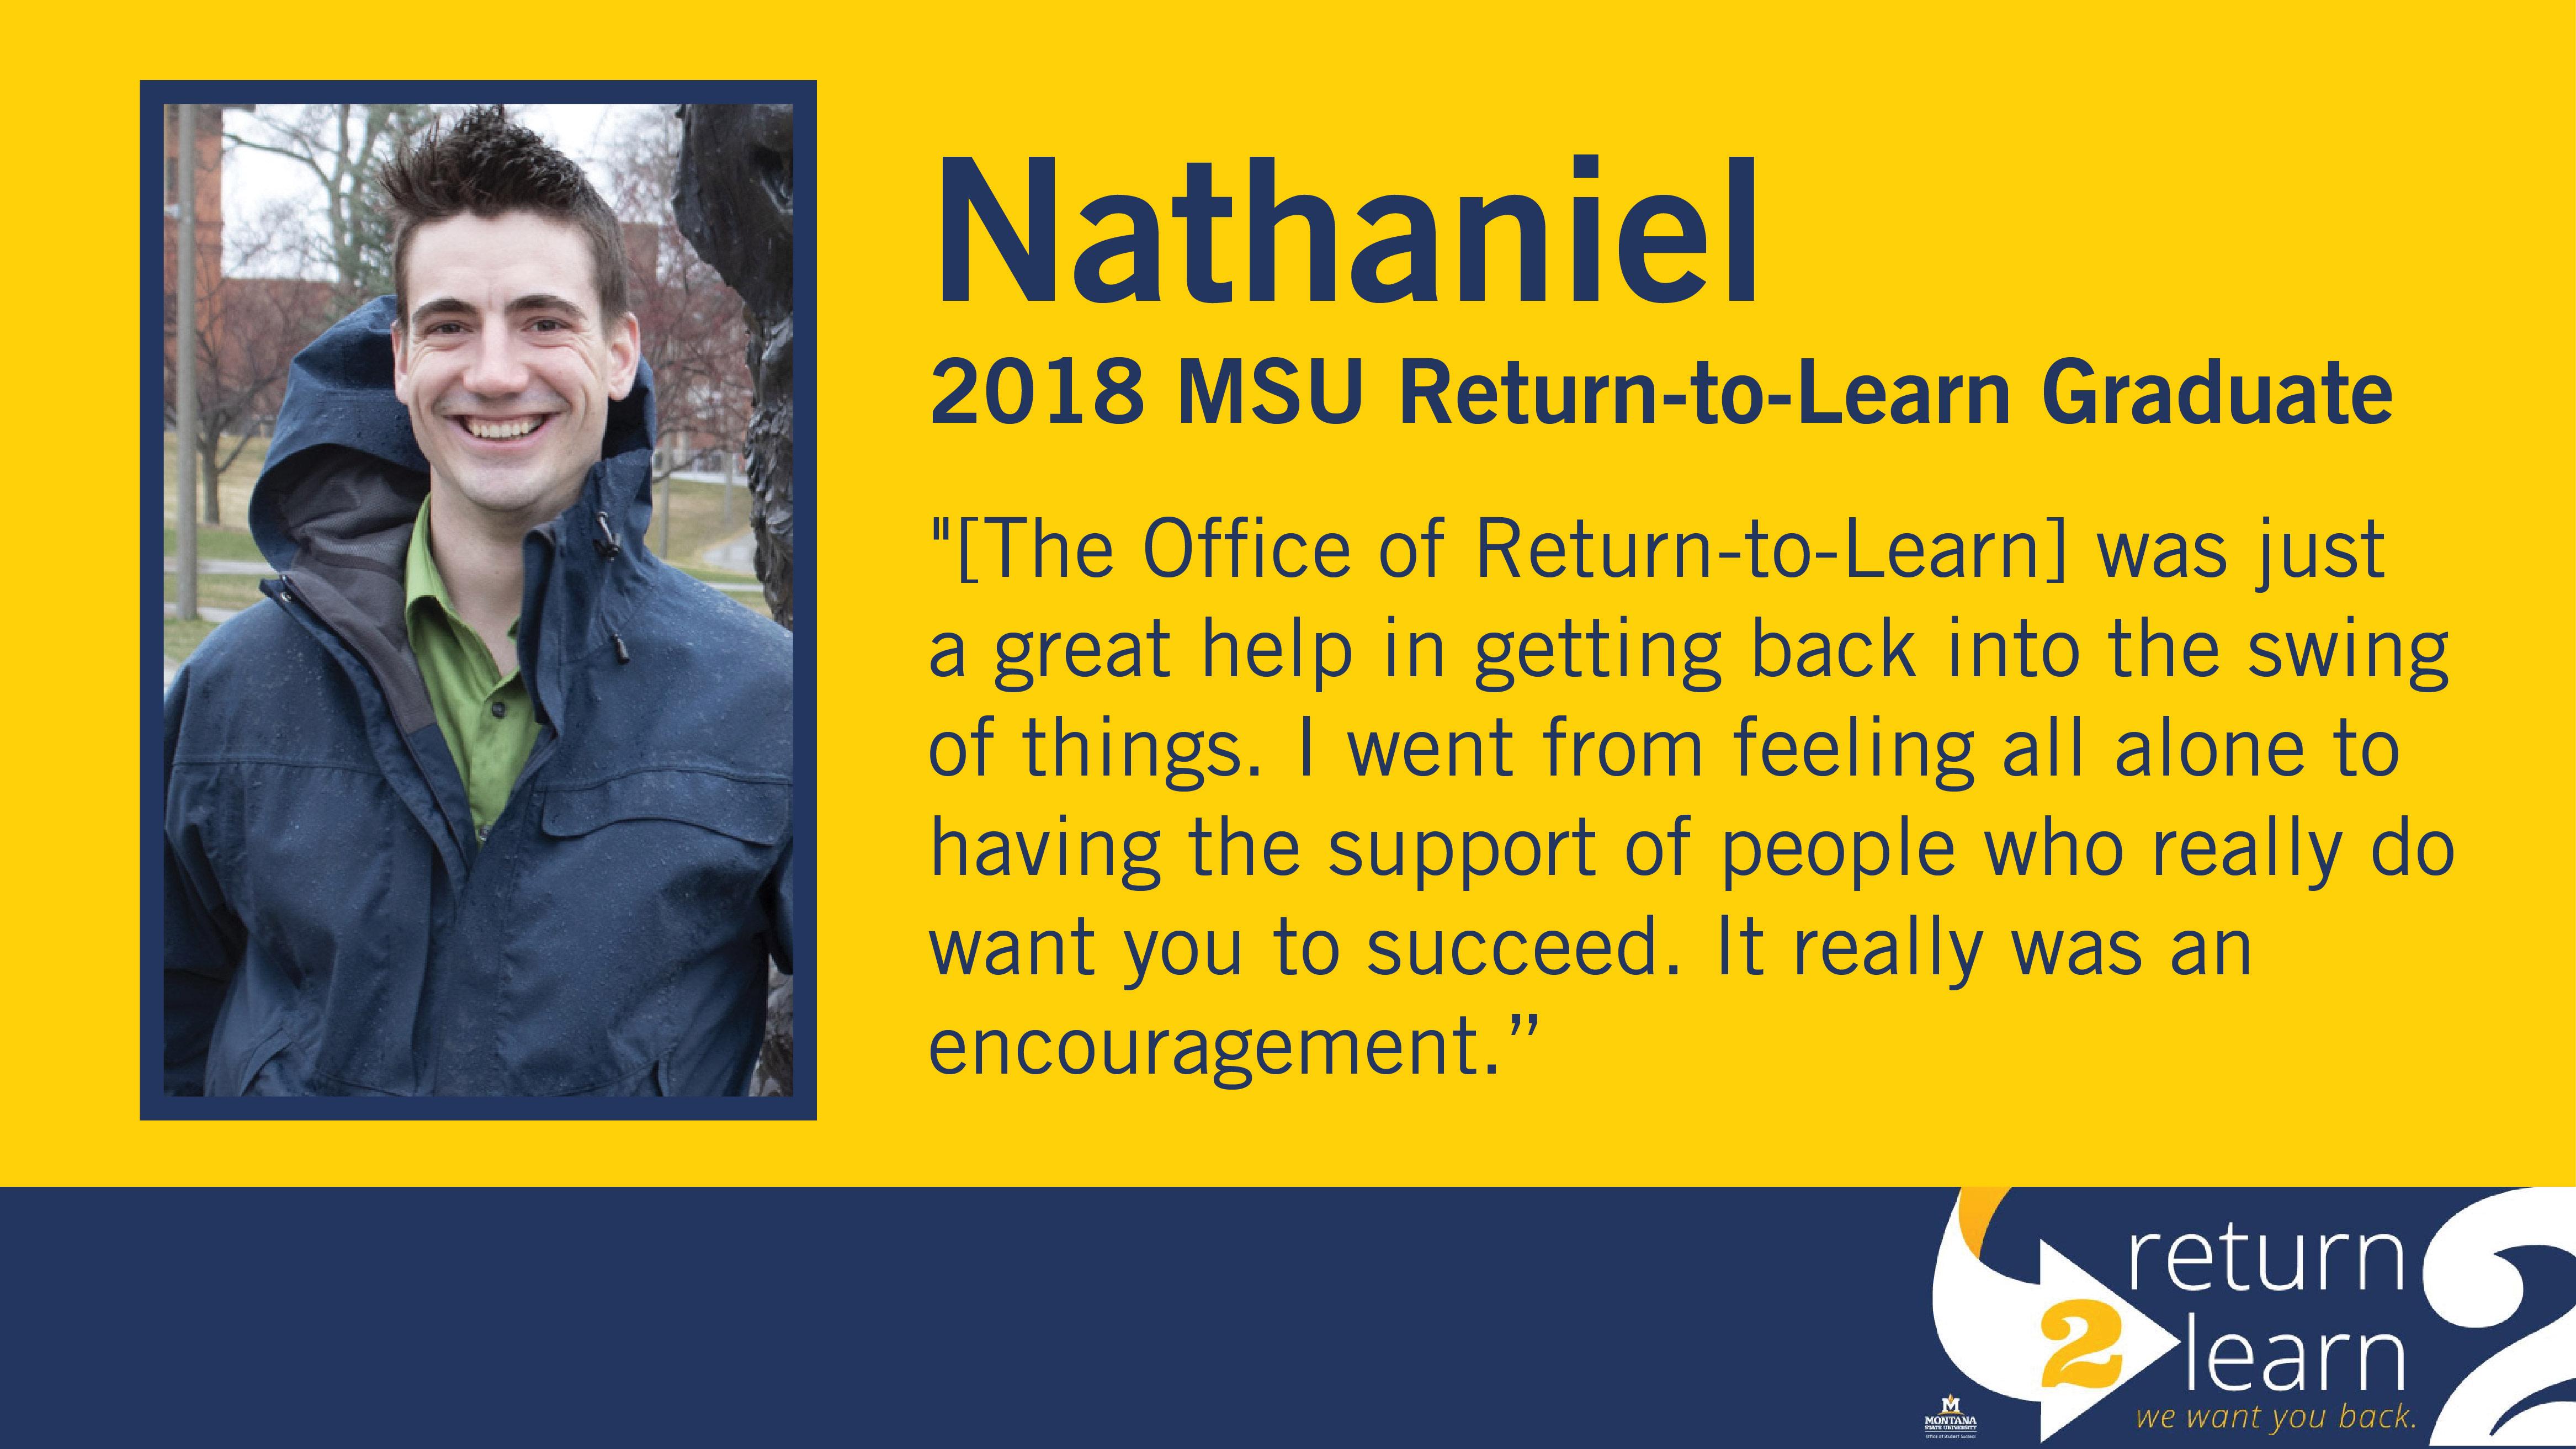 Nathaniel, 2018 MSU Return-to-Learn Graduate